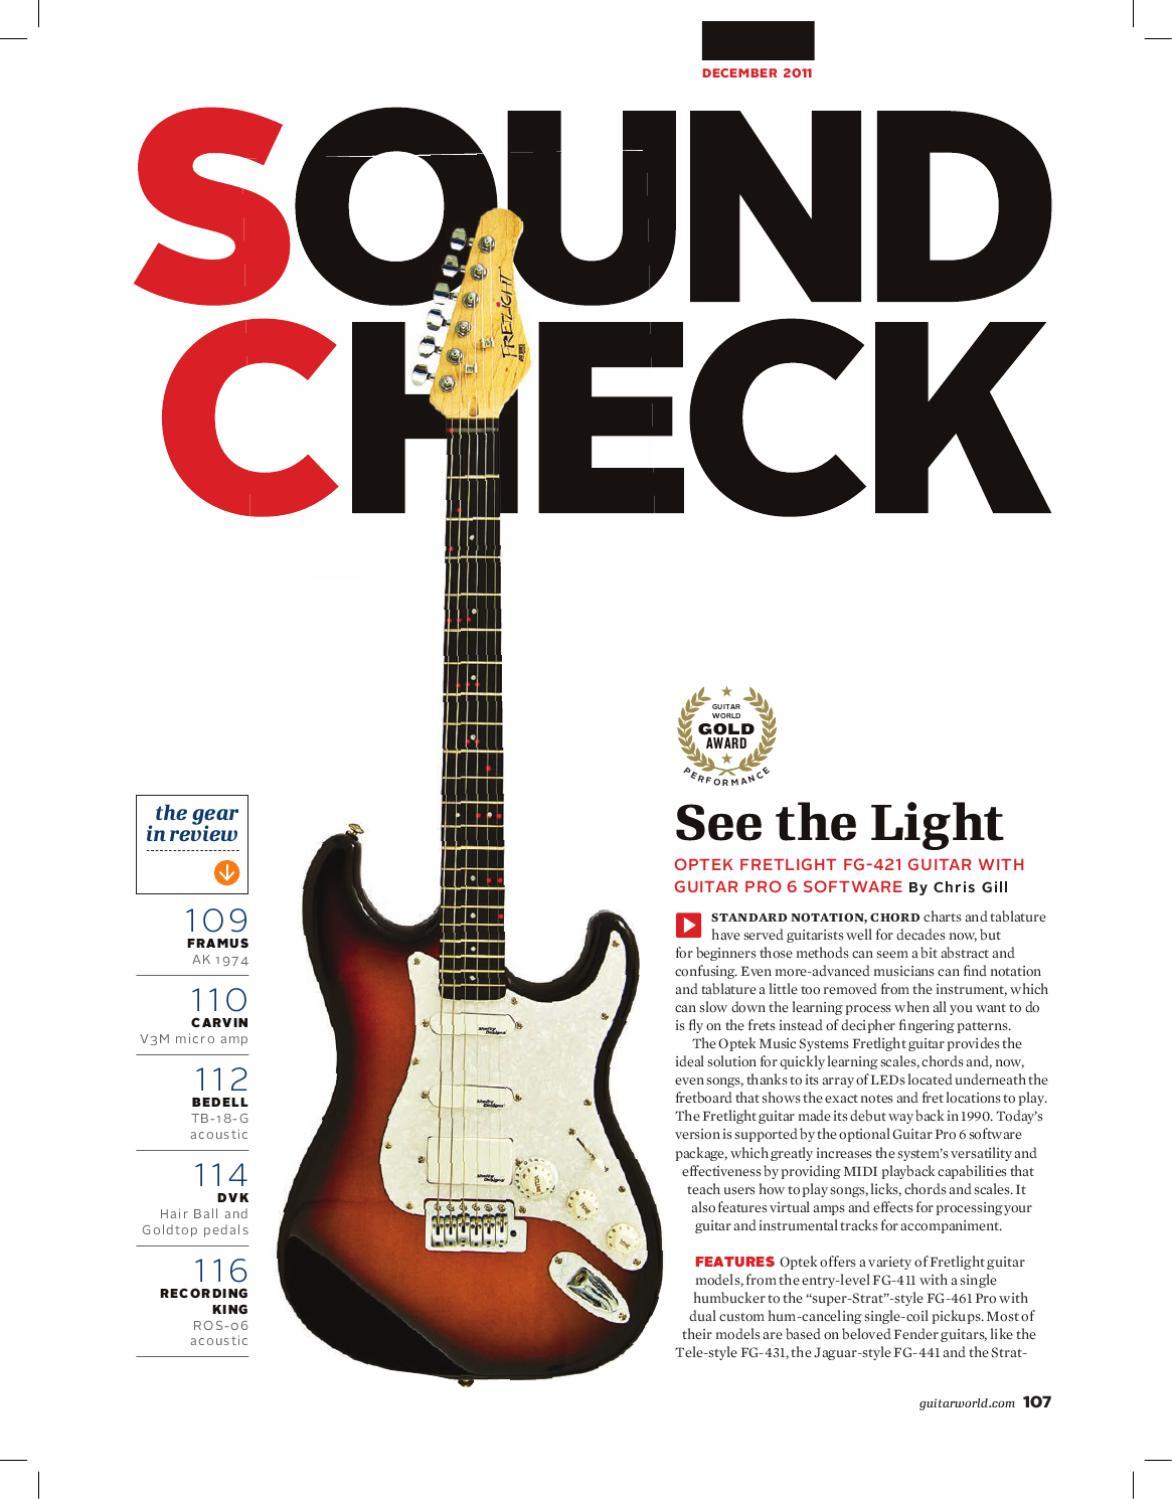 guitar world fretlight review dec 2011 by arobas music guitar pro issuu. Black Bedroom Furniture Sets. Home Design Ideas